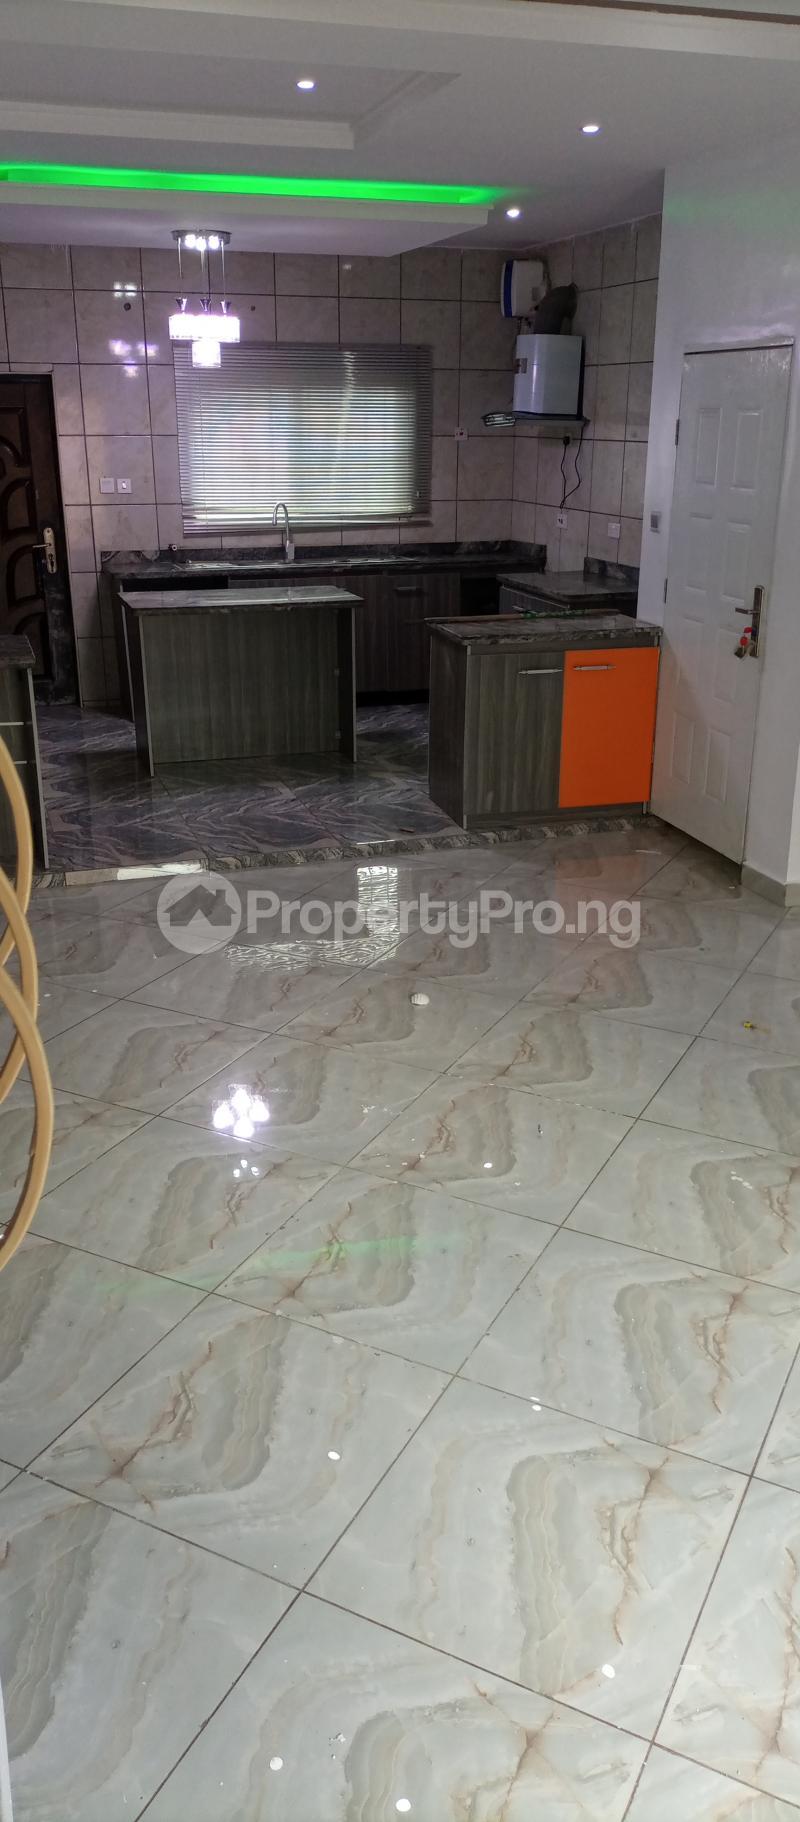 2 bedroom Flat / Apartment for rent Beside Victorotti School, Olokuta, Idi Aba Idi Aba Abeokuta Ogun - 0